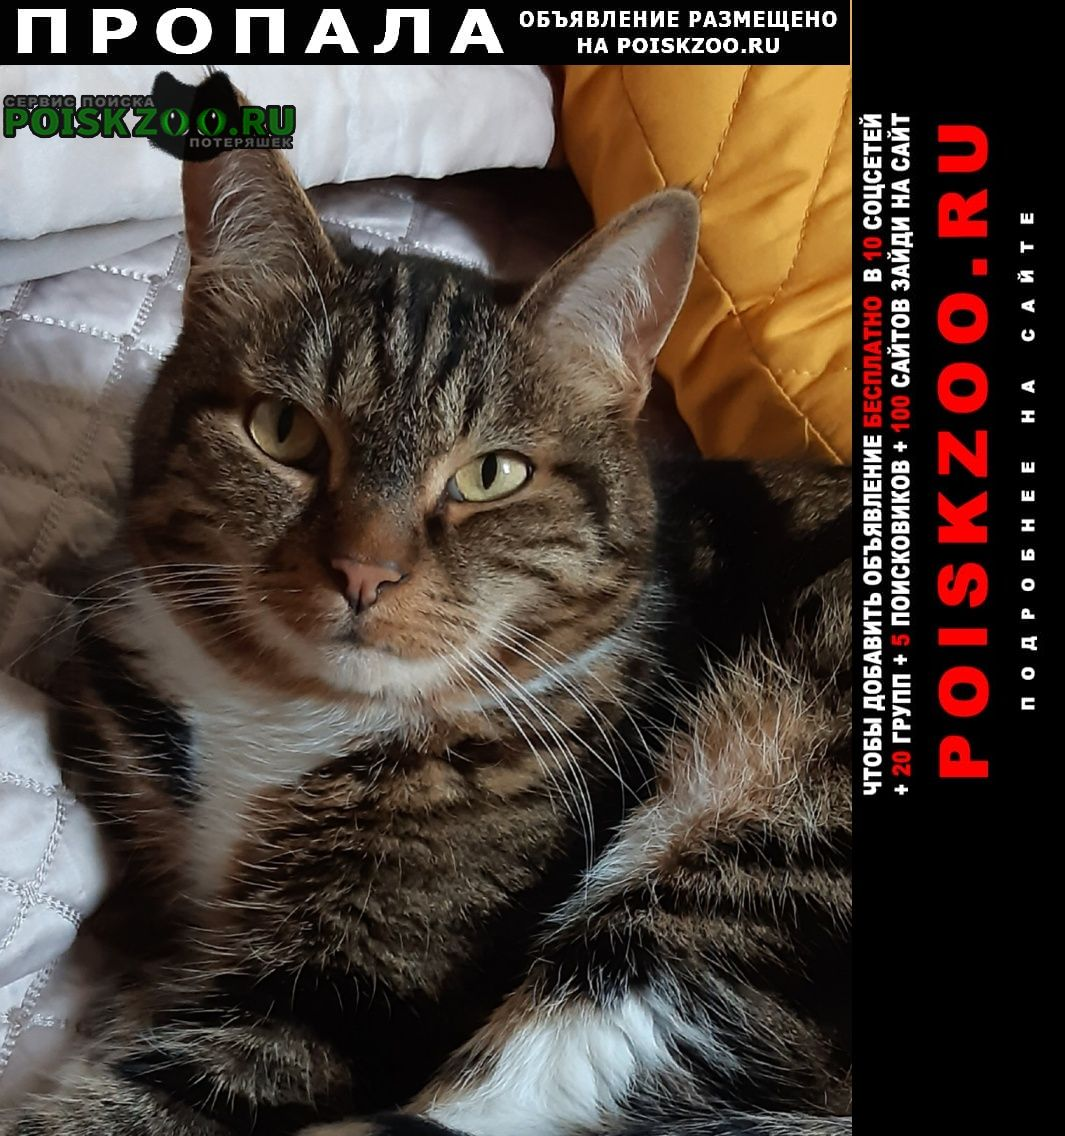 Пропал кот Петрозаводск